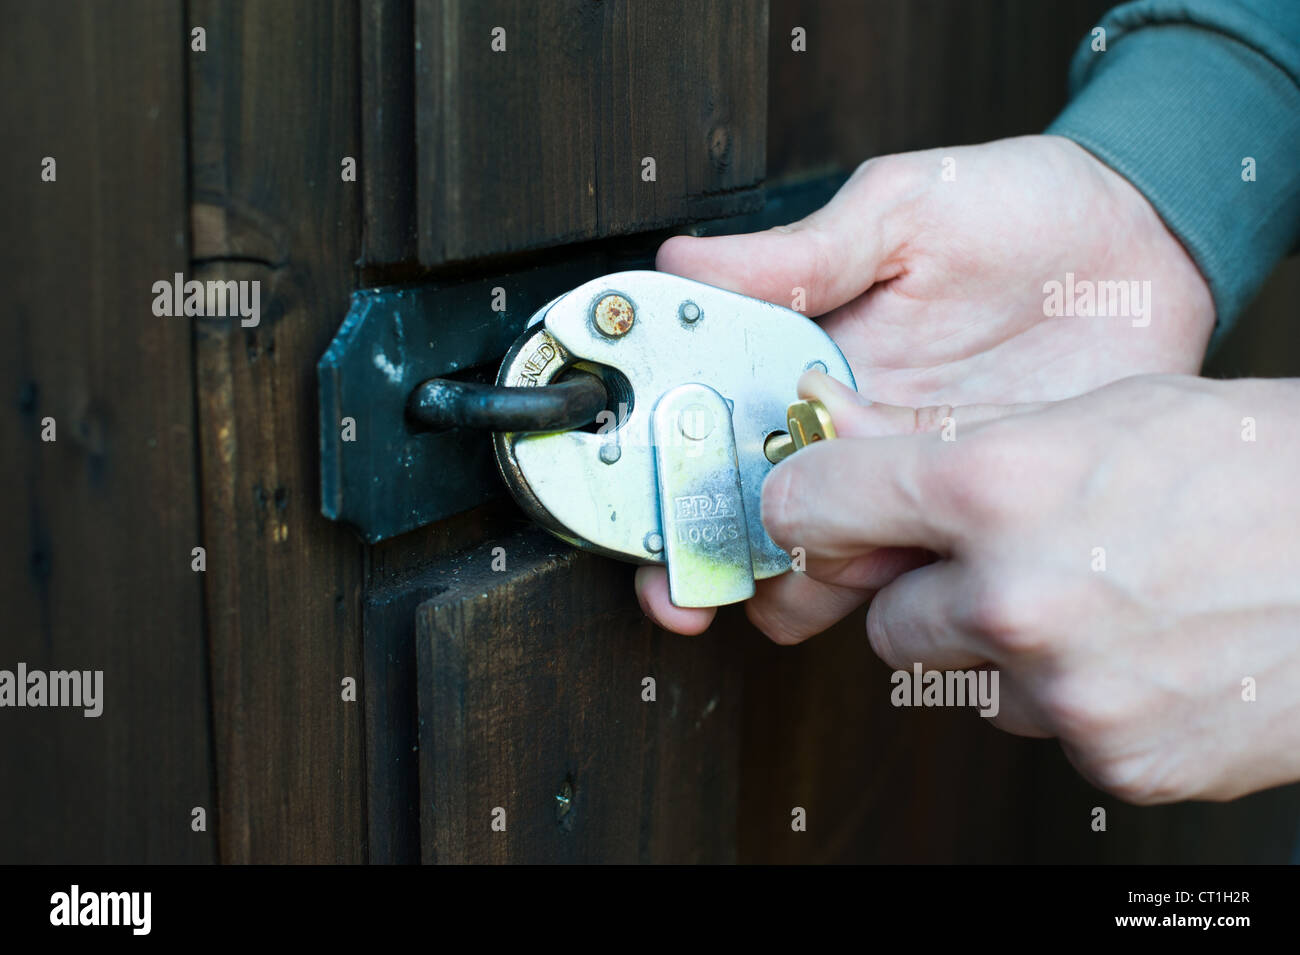 Verrouiller une porte avec un cadenas. Photo Stock